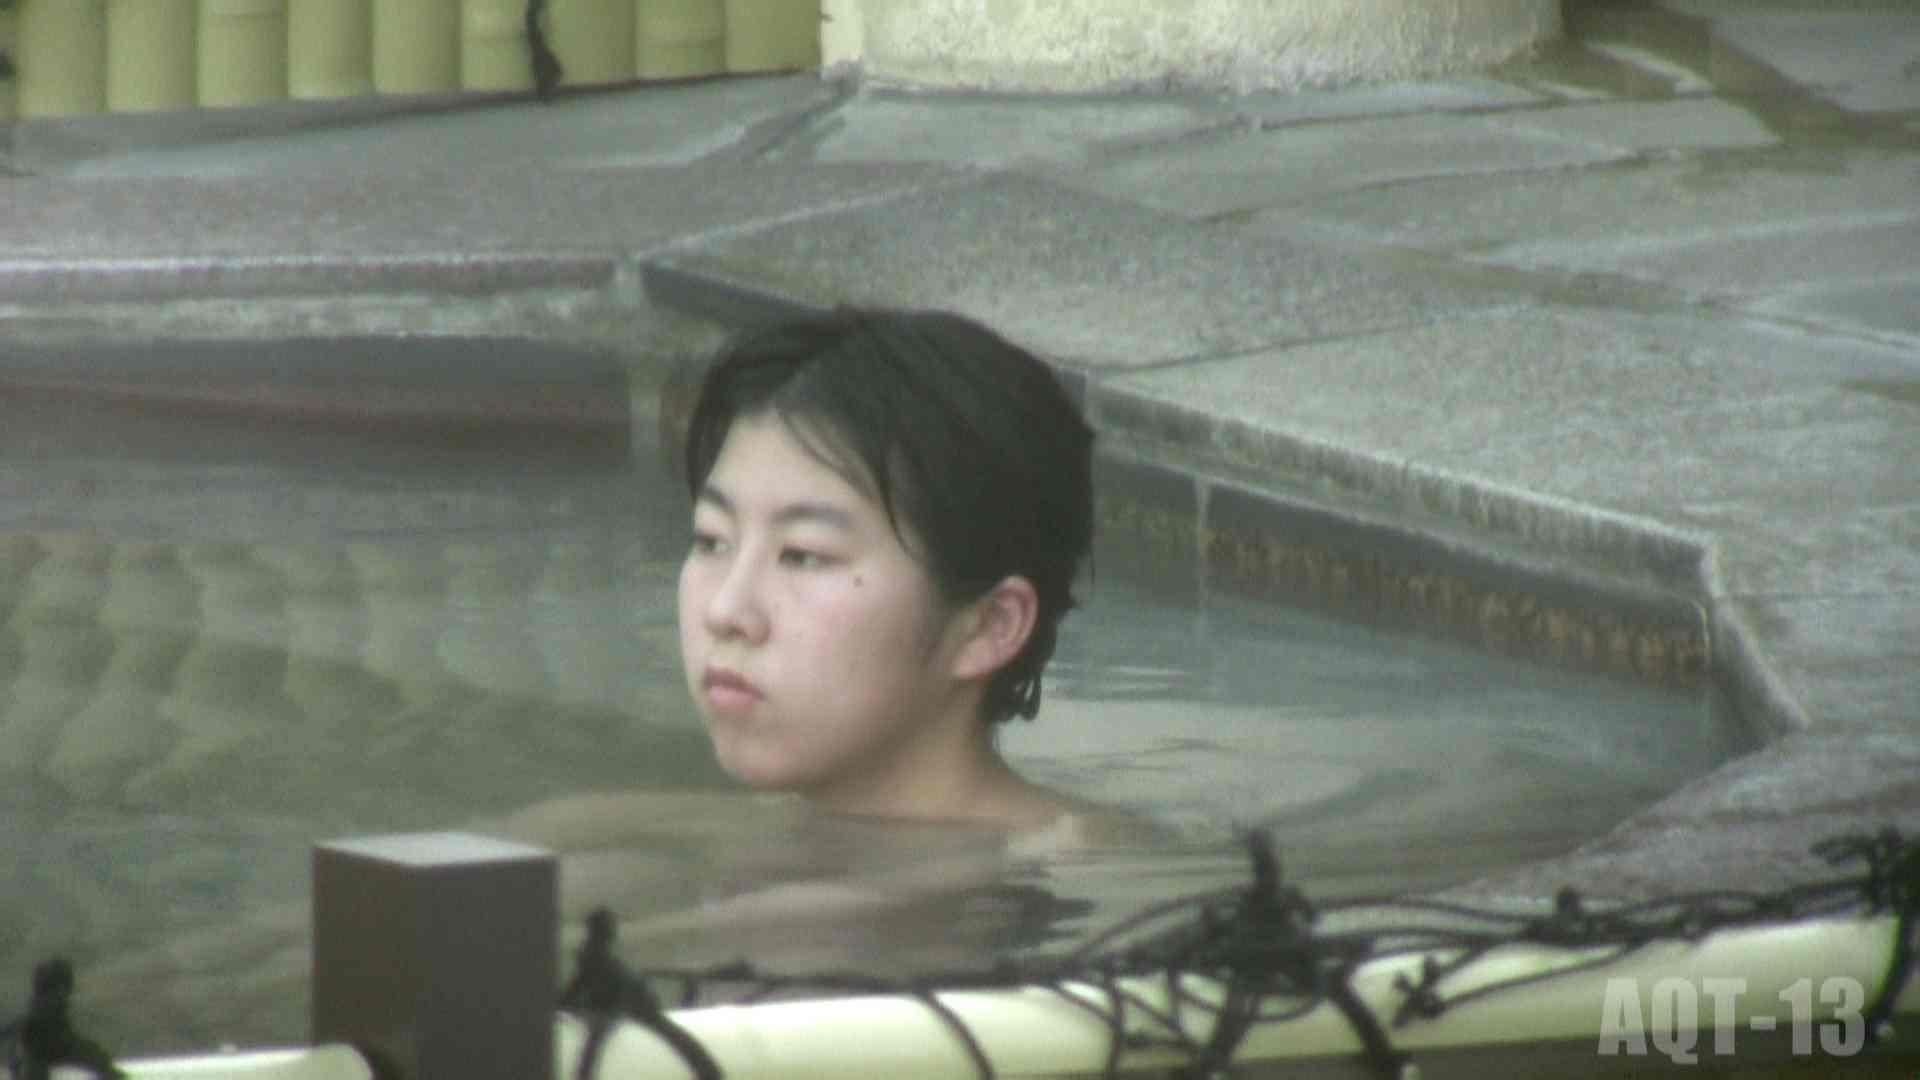 Aquaな露天風呂Vol.816 盗撮   OLエロ画像  105PICs 46